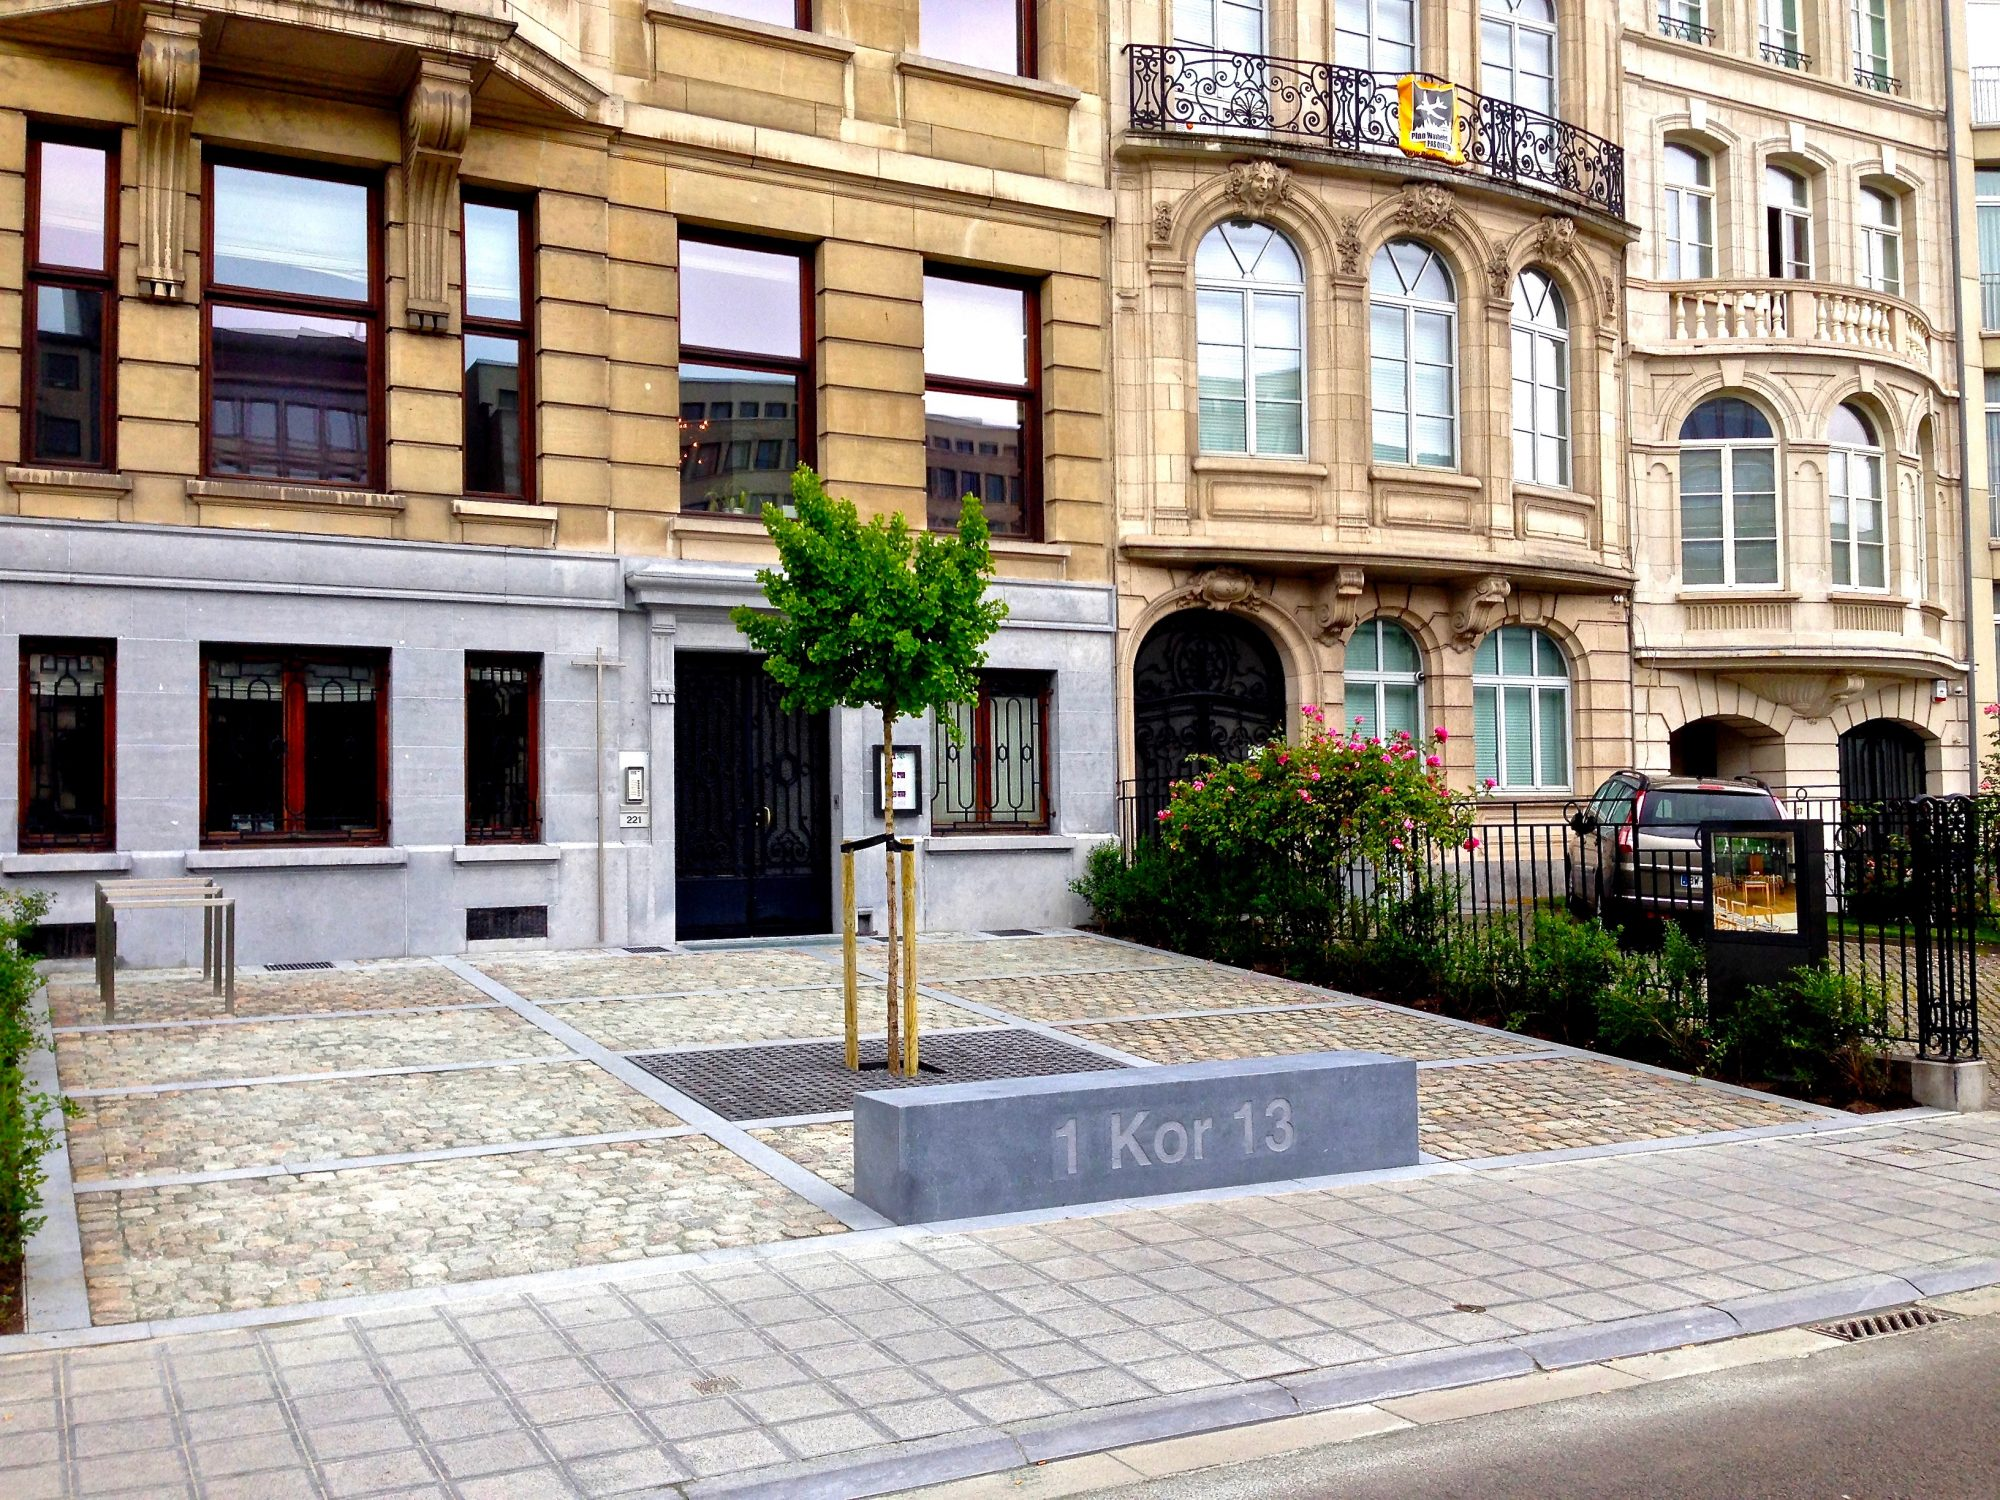 Brüssel, St. Paul, Vorplatz. Leo Zogmayer, Thomas N Pauli, Catherine de Bie, 2015